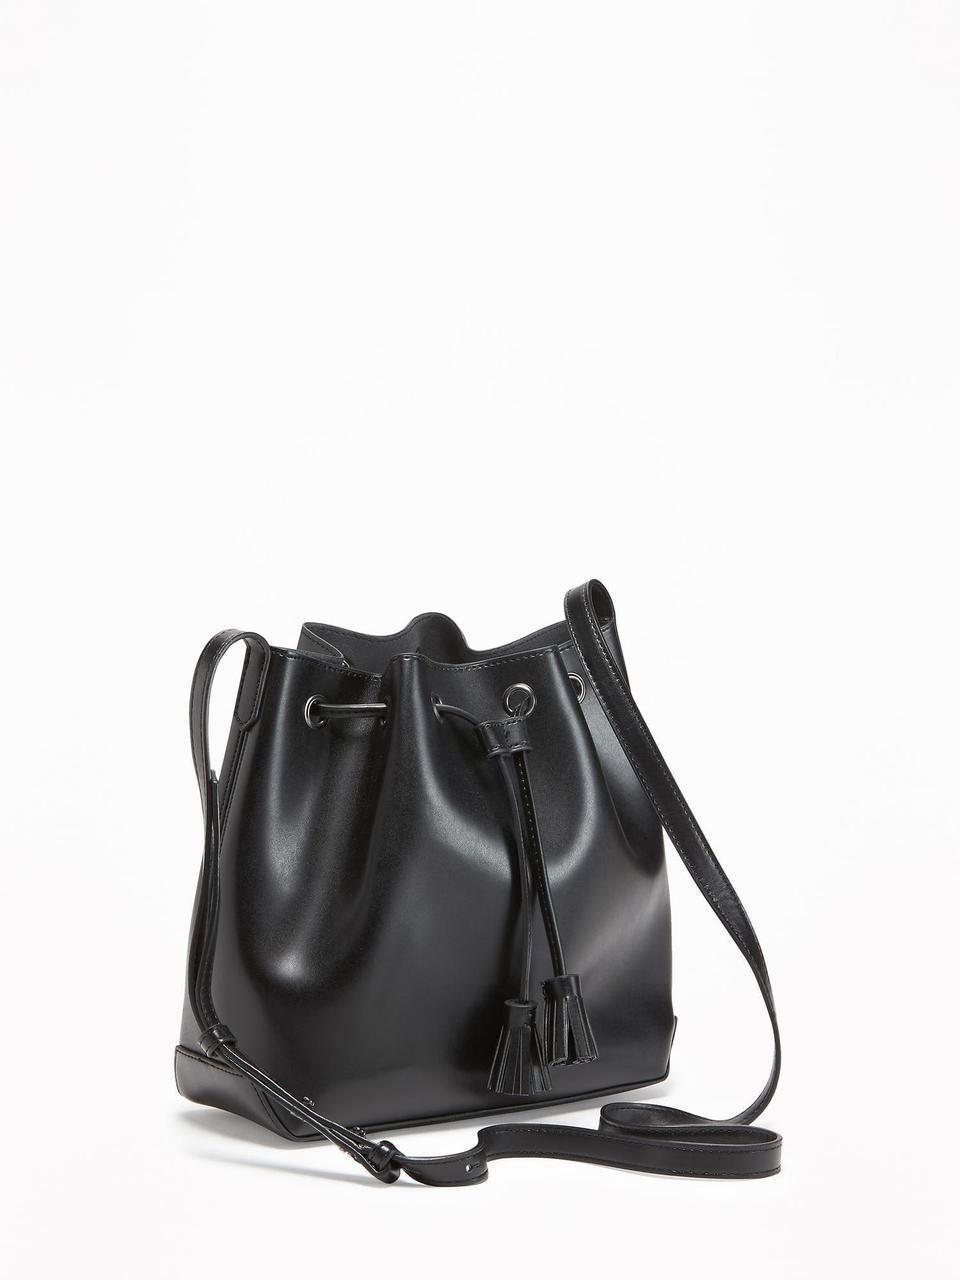 Old Navy сумочка черная оригинал